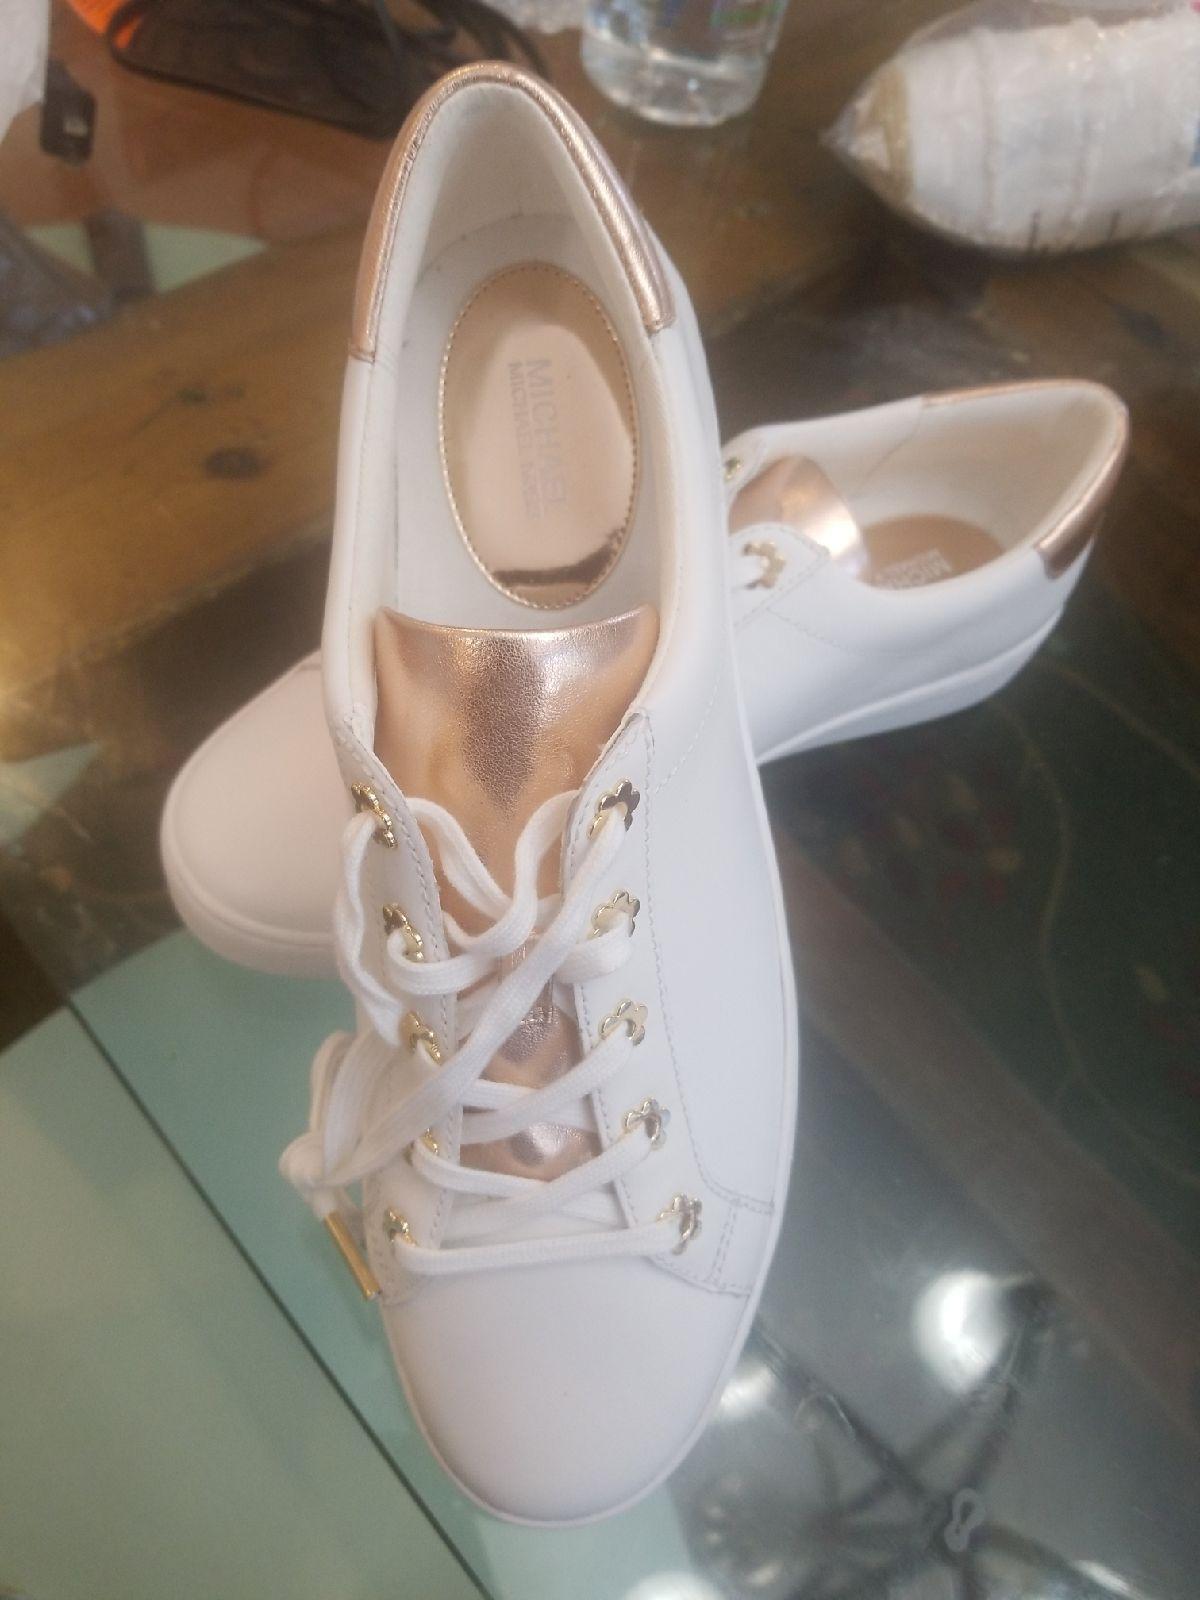 Michael kors fashion, Sneakers fashion